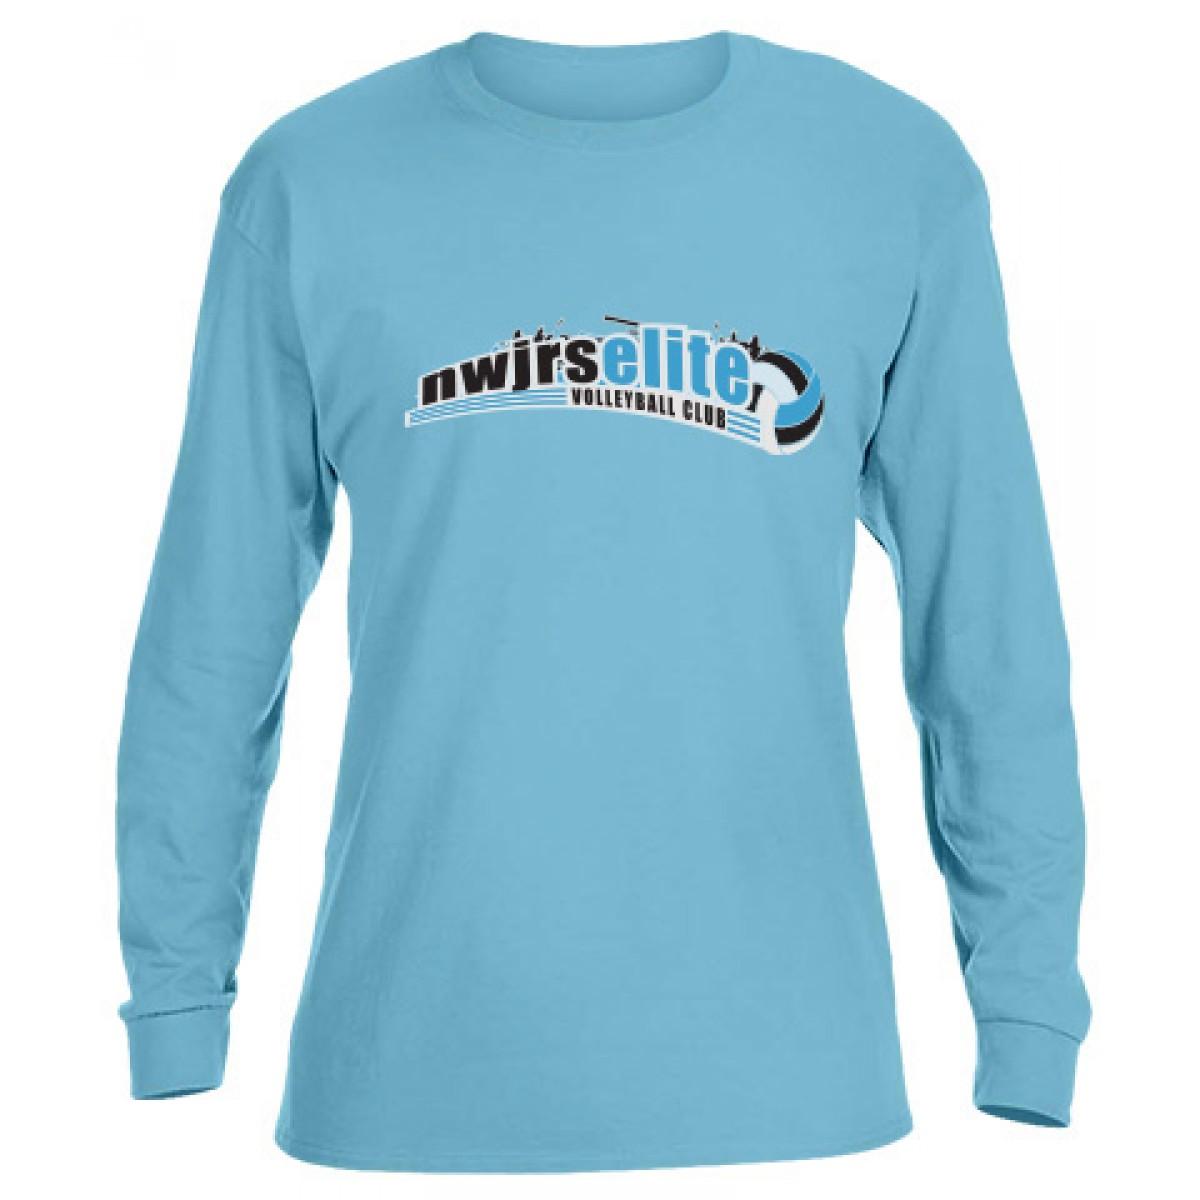 Northwest Volleyball Foundation Scholarship Program-Sky Blue-L